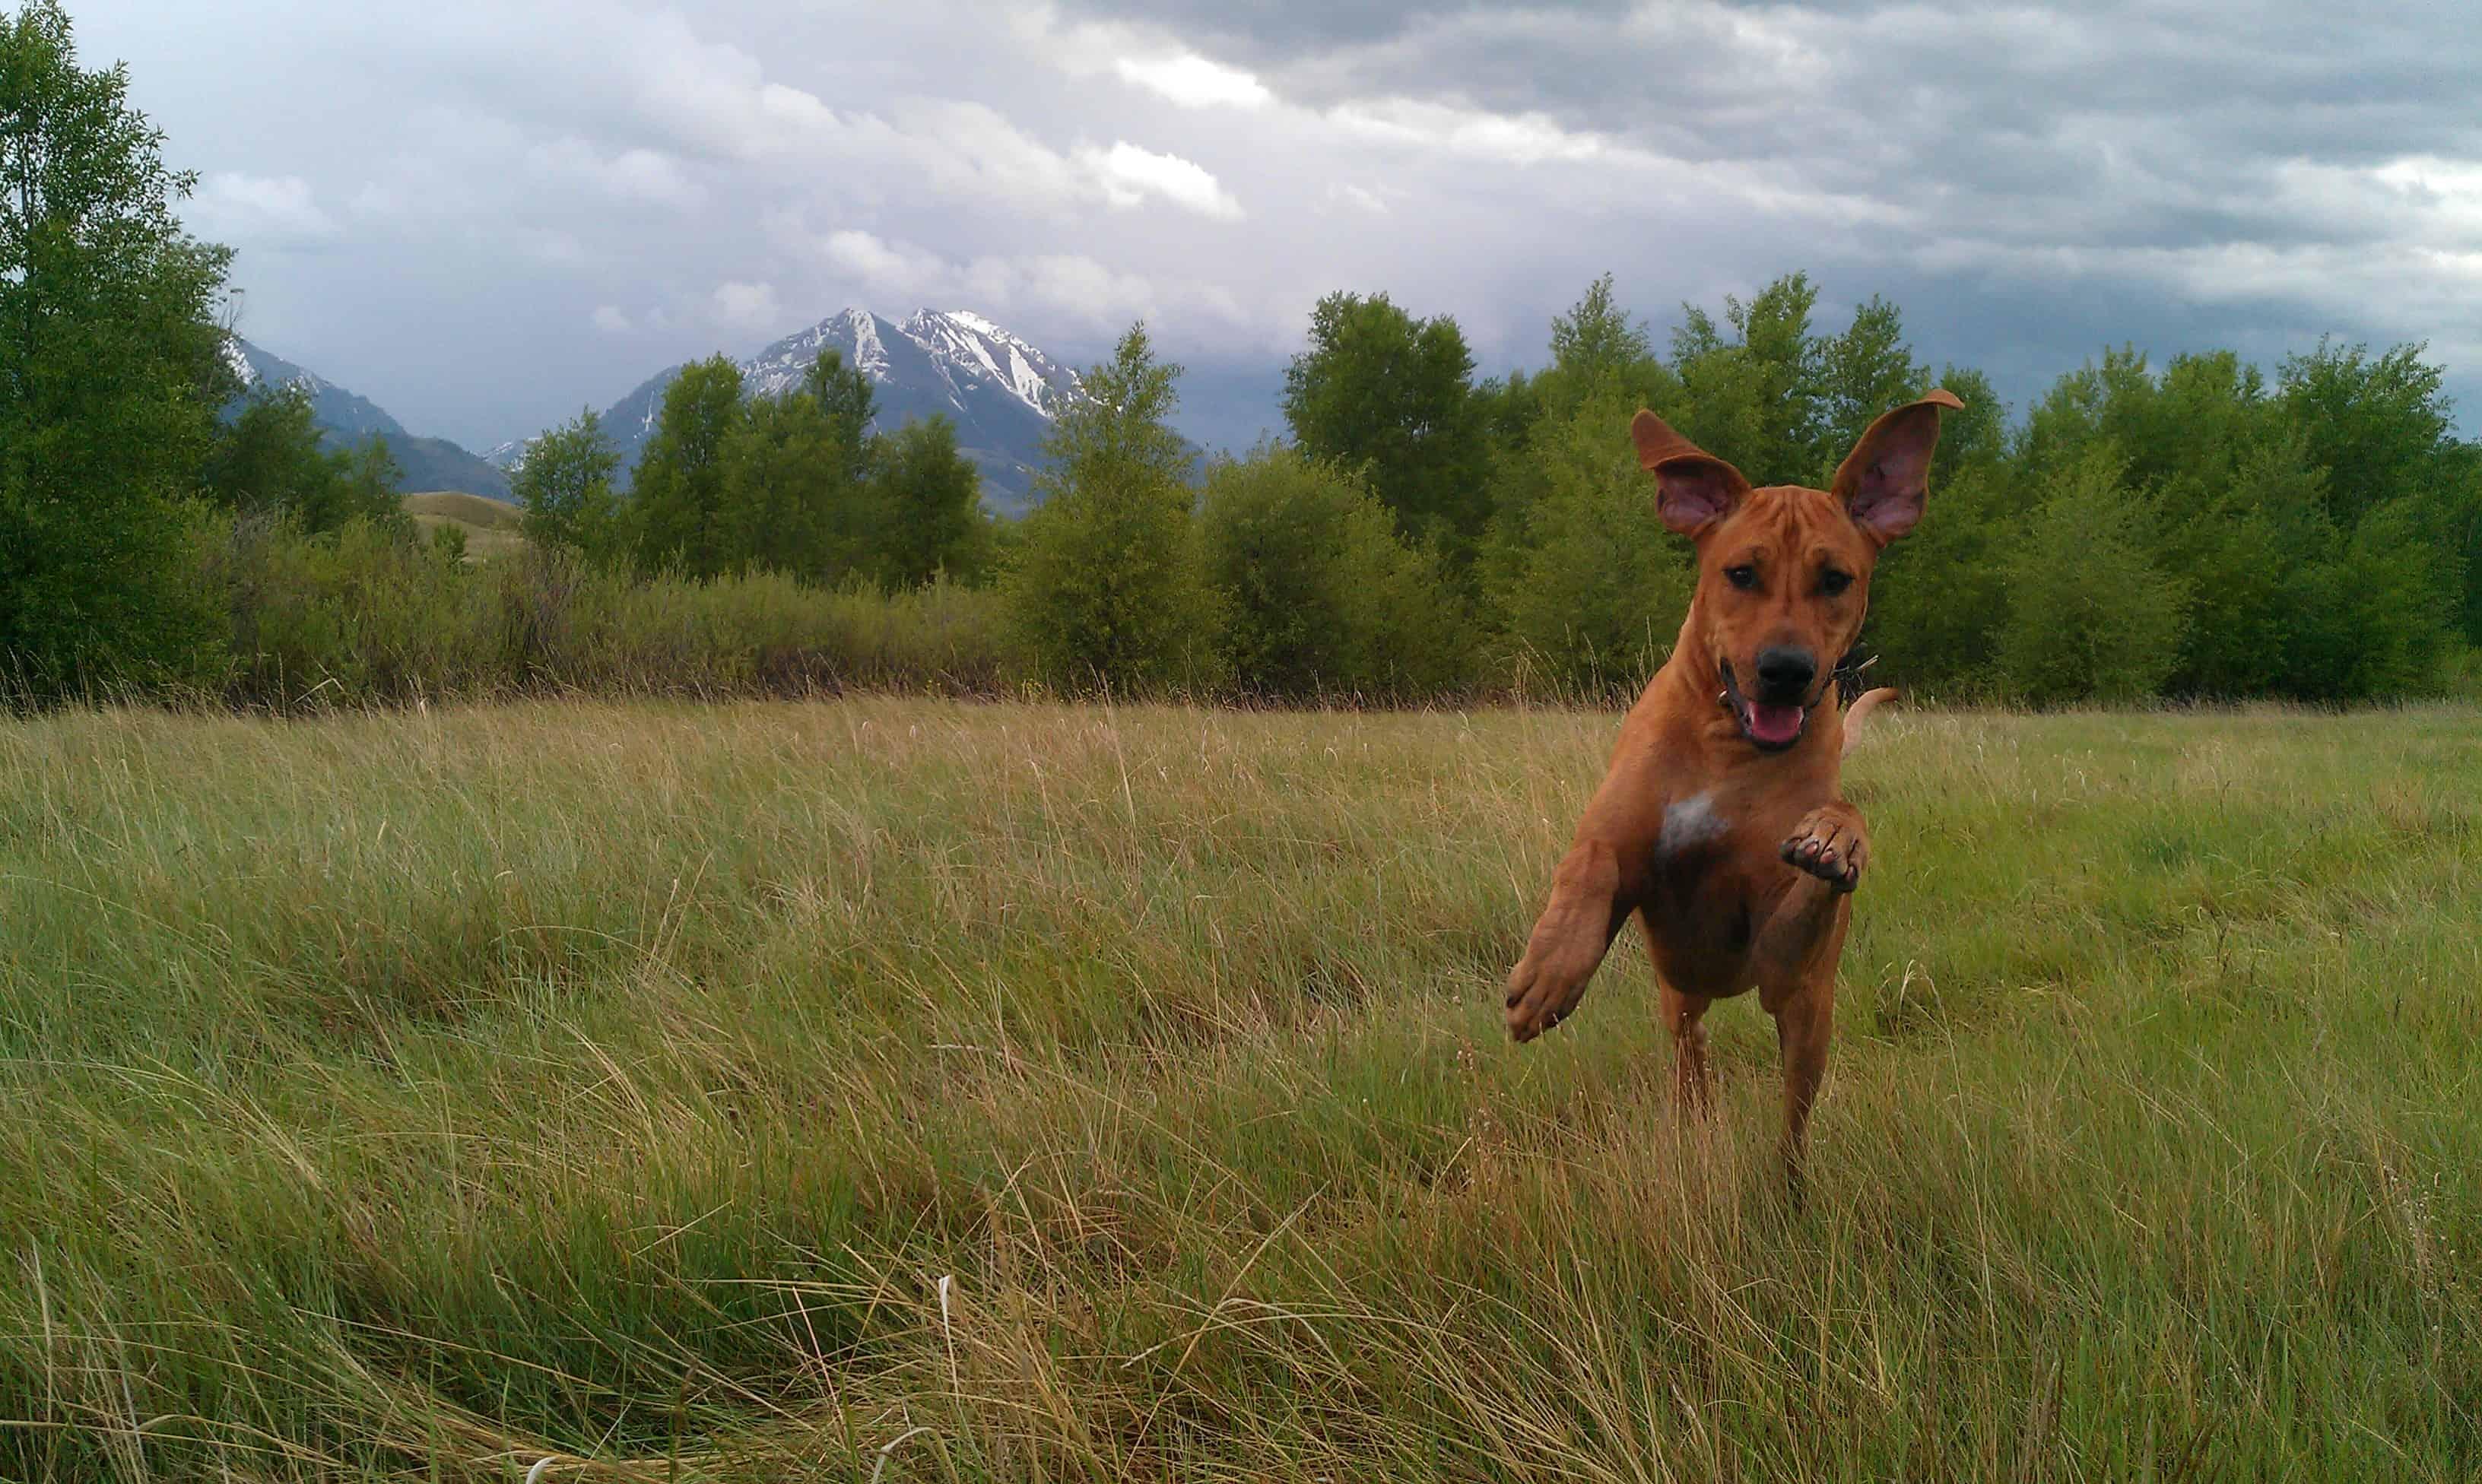 Rhodesian Ridgeback, adventure, dogs, marking our territory, photos